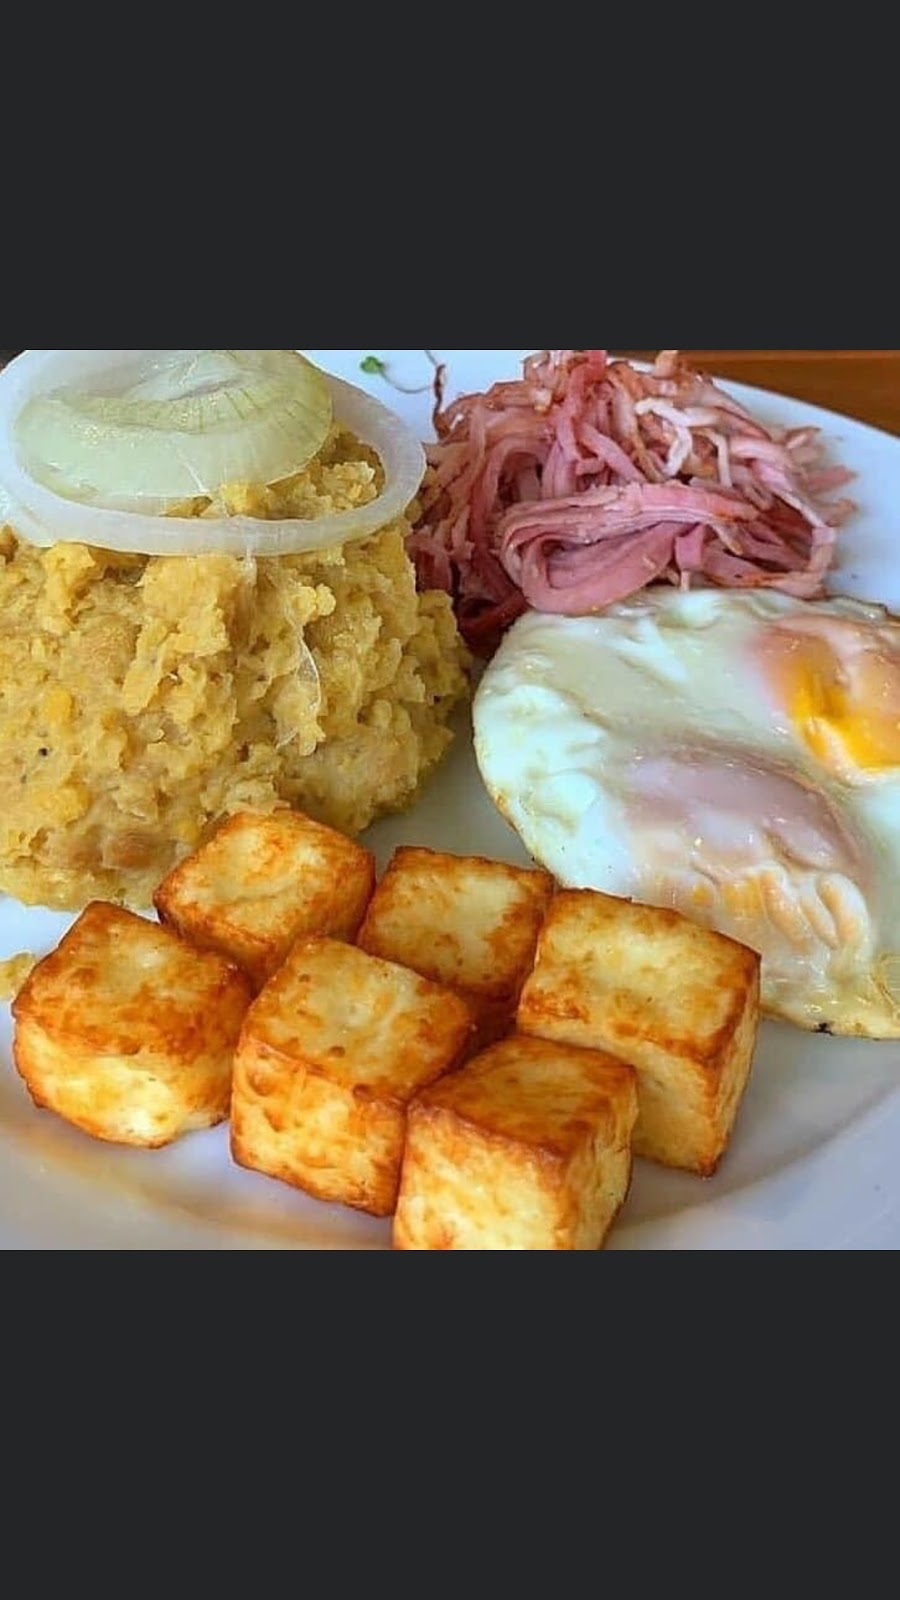 Javiers Mini Market   restaurant   454 King St, Pottstown, PA 19464, USA   4846245593 OR +1 484-624-5593